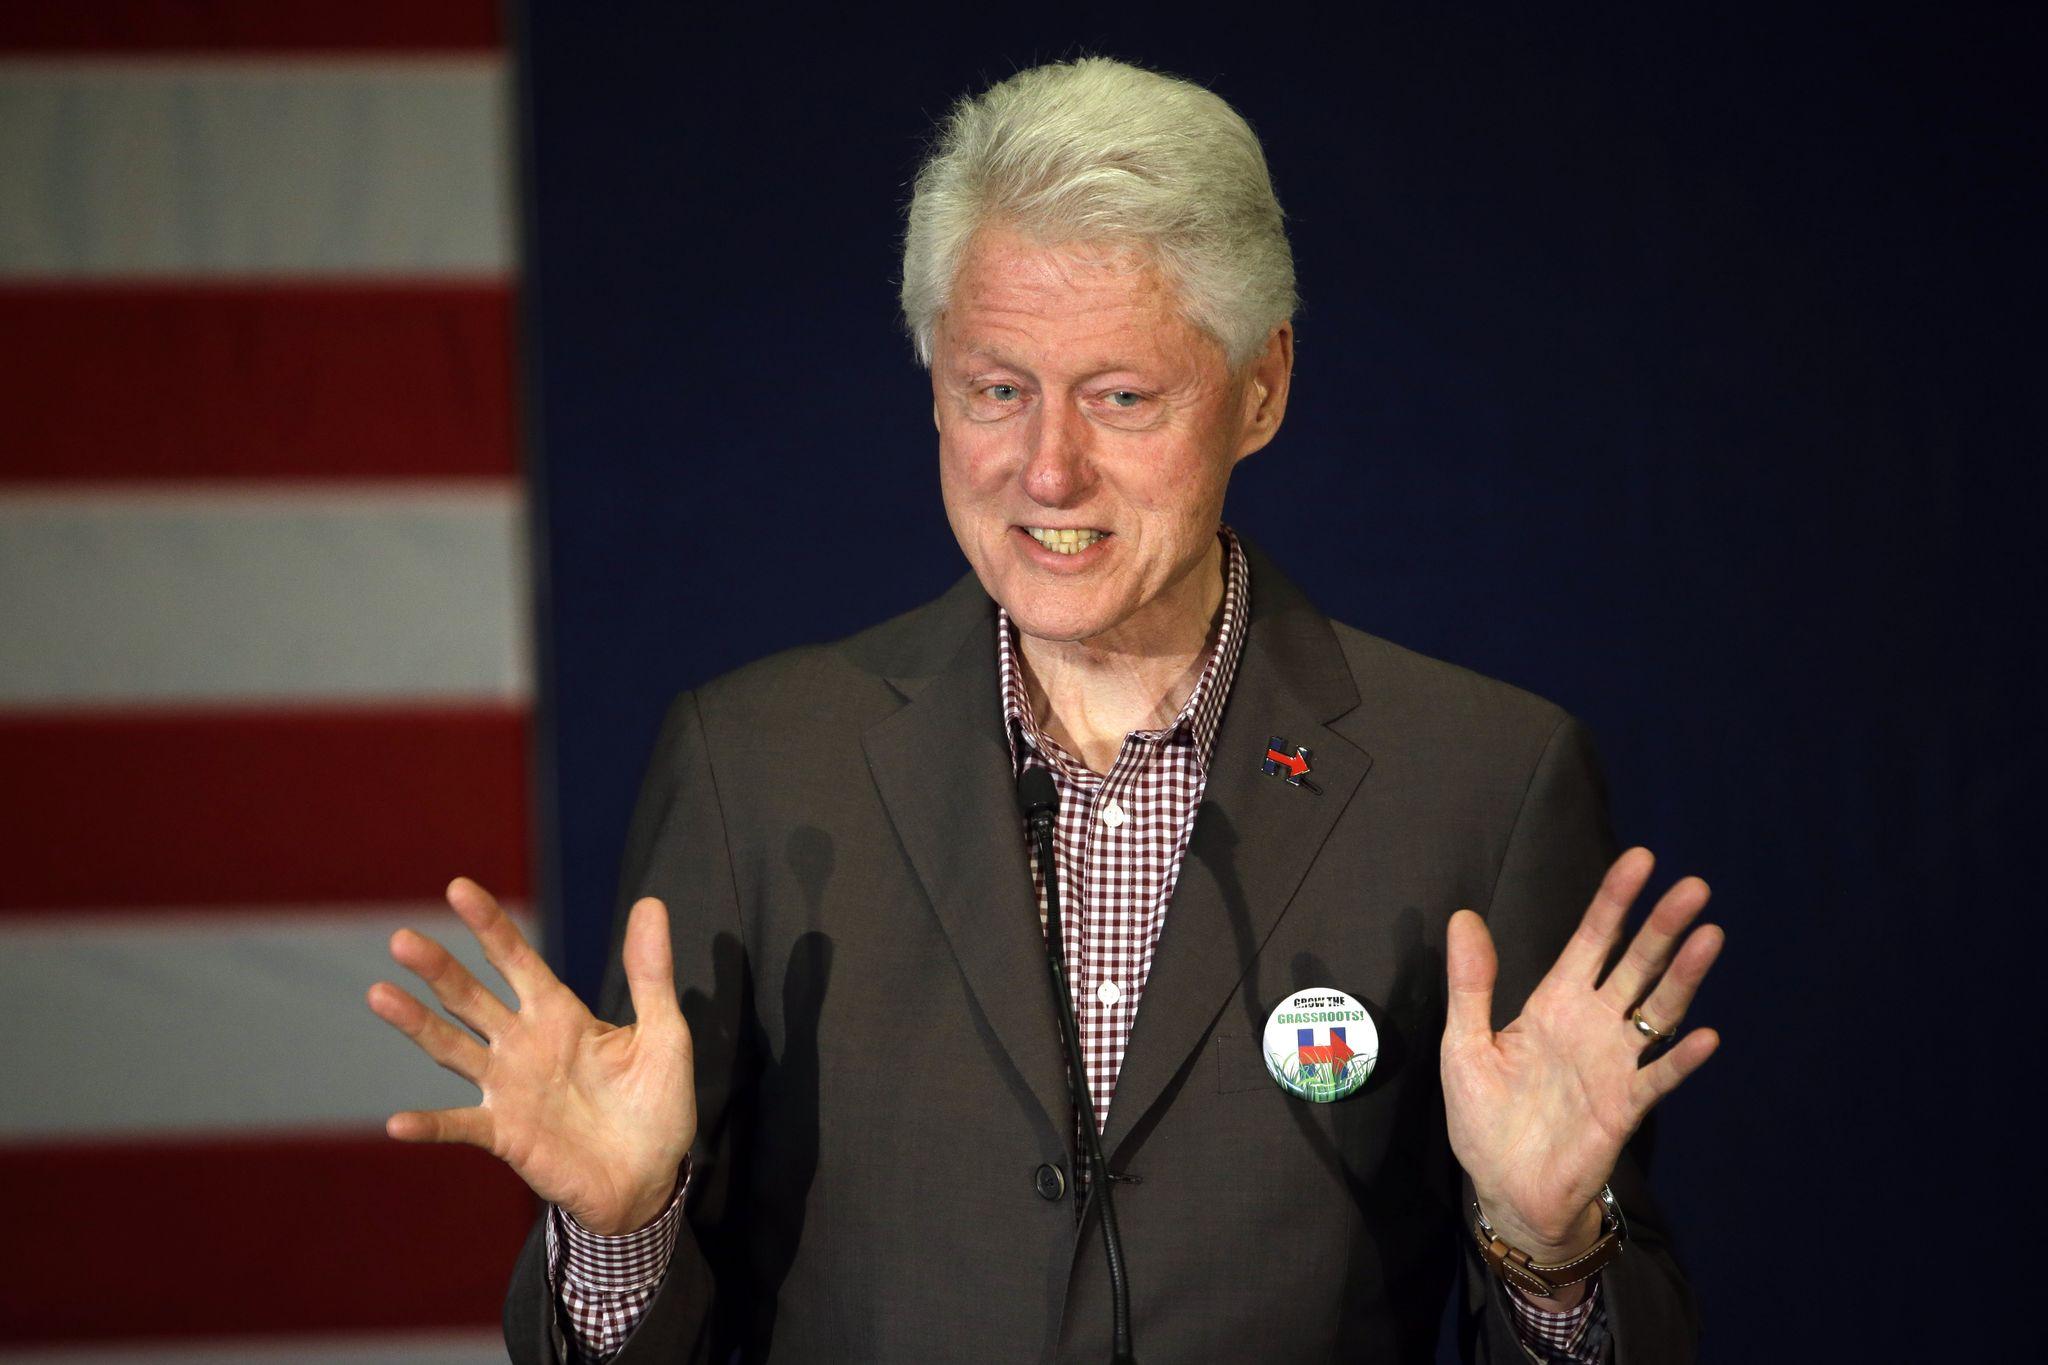 Bill Clinton ditched Secret Service on multiple 'Lolita Express' flights: Report